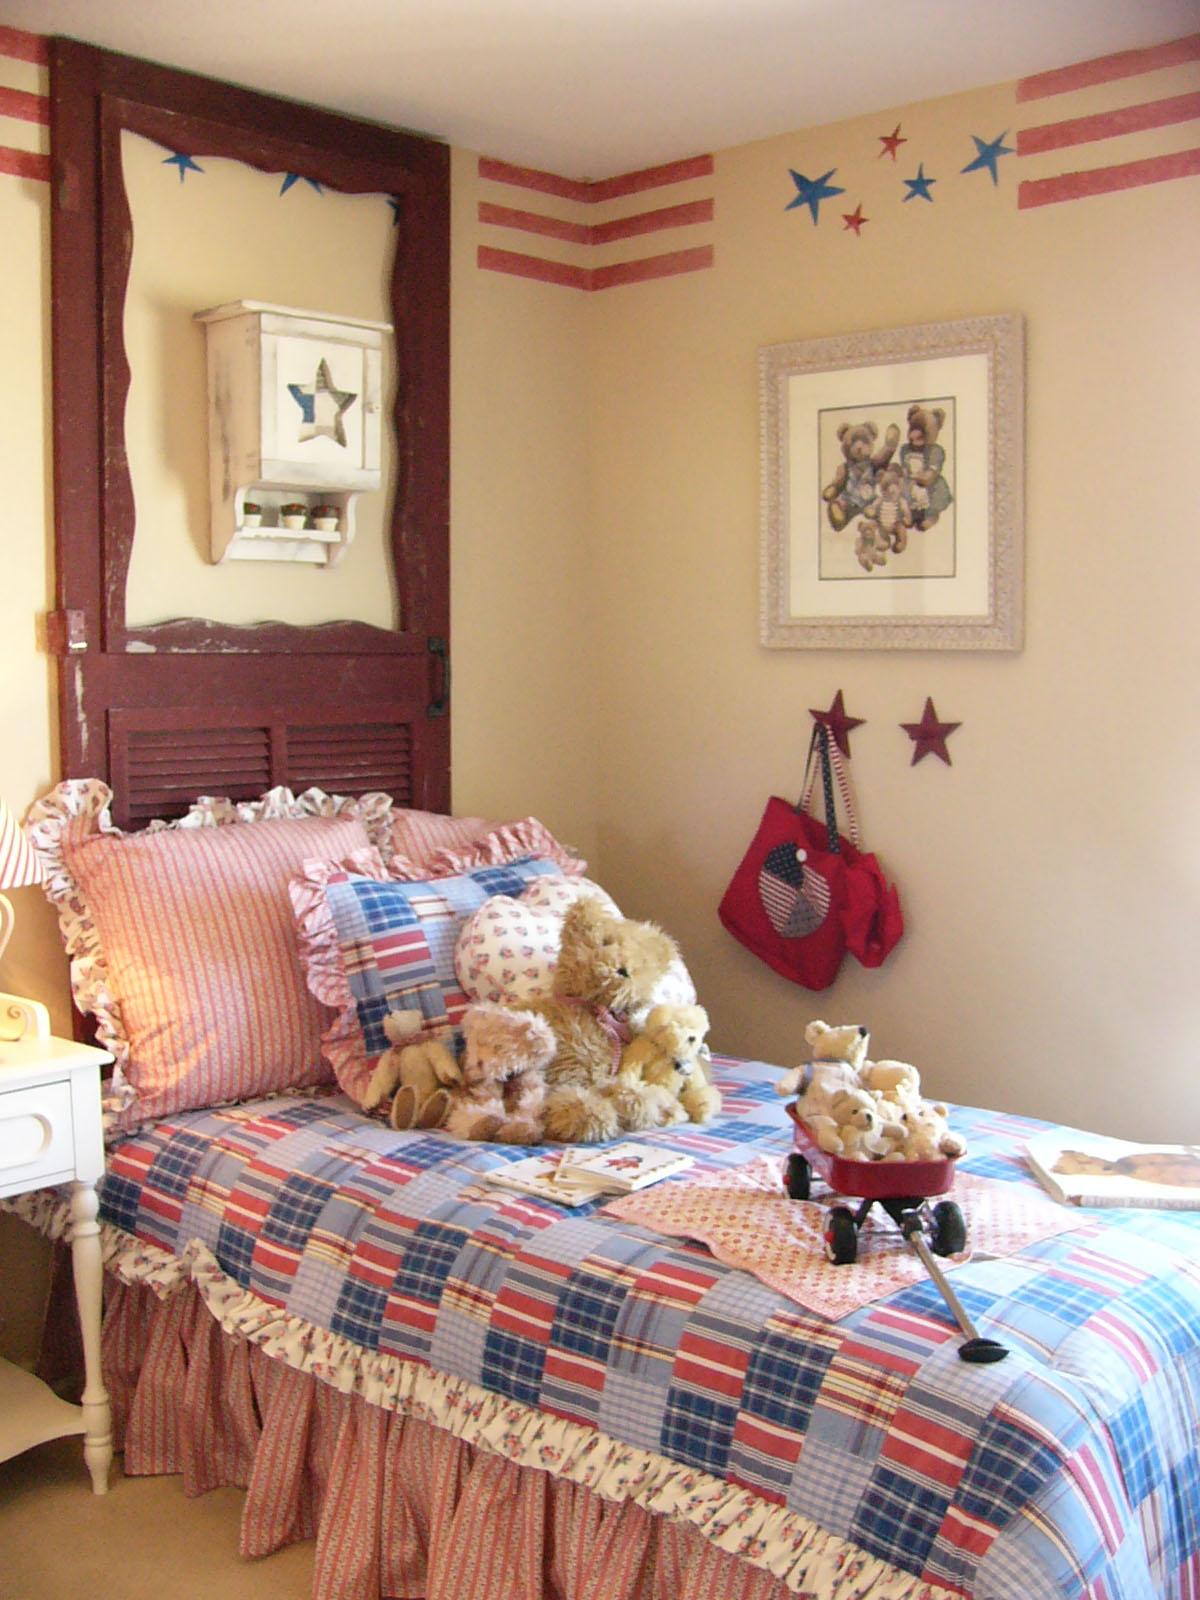 decorating with old doors. Black Bedroom Furniture Sets. Home Design Ideas